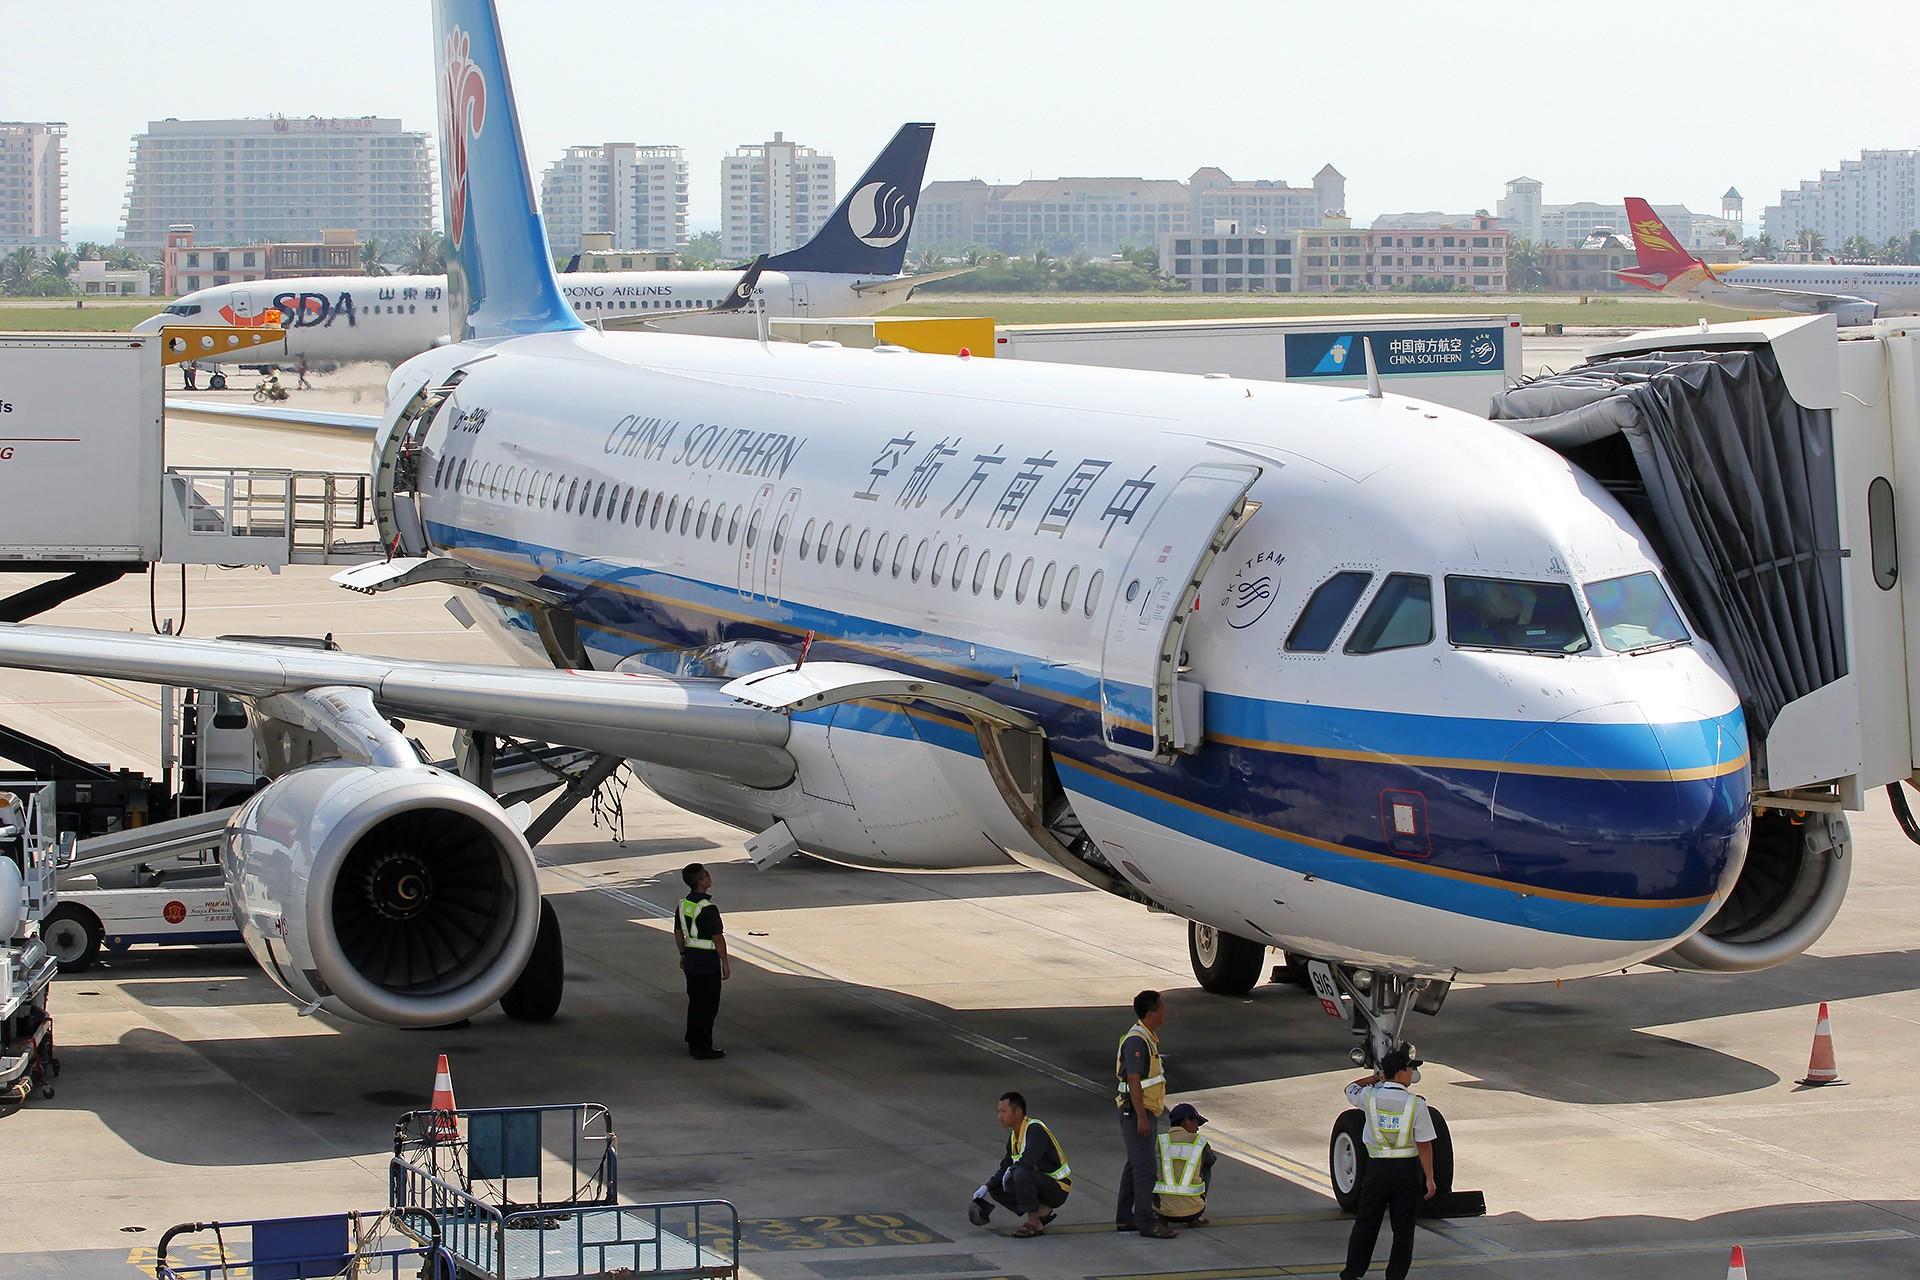 Re:[原创][DLC]。。。DLC & SYX。。。 AIRBUS A320-200 B-9916 中国三亚凤凰国际机场